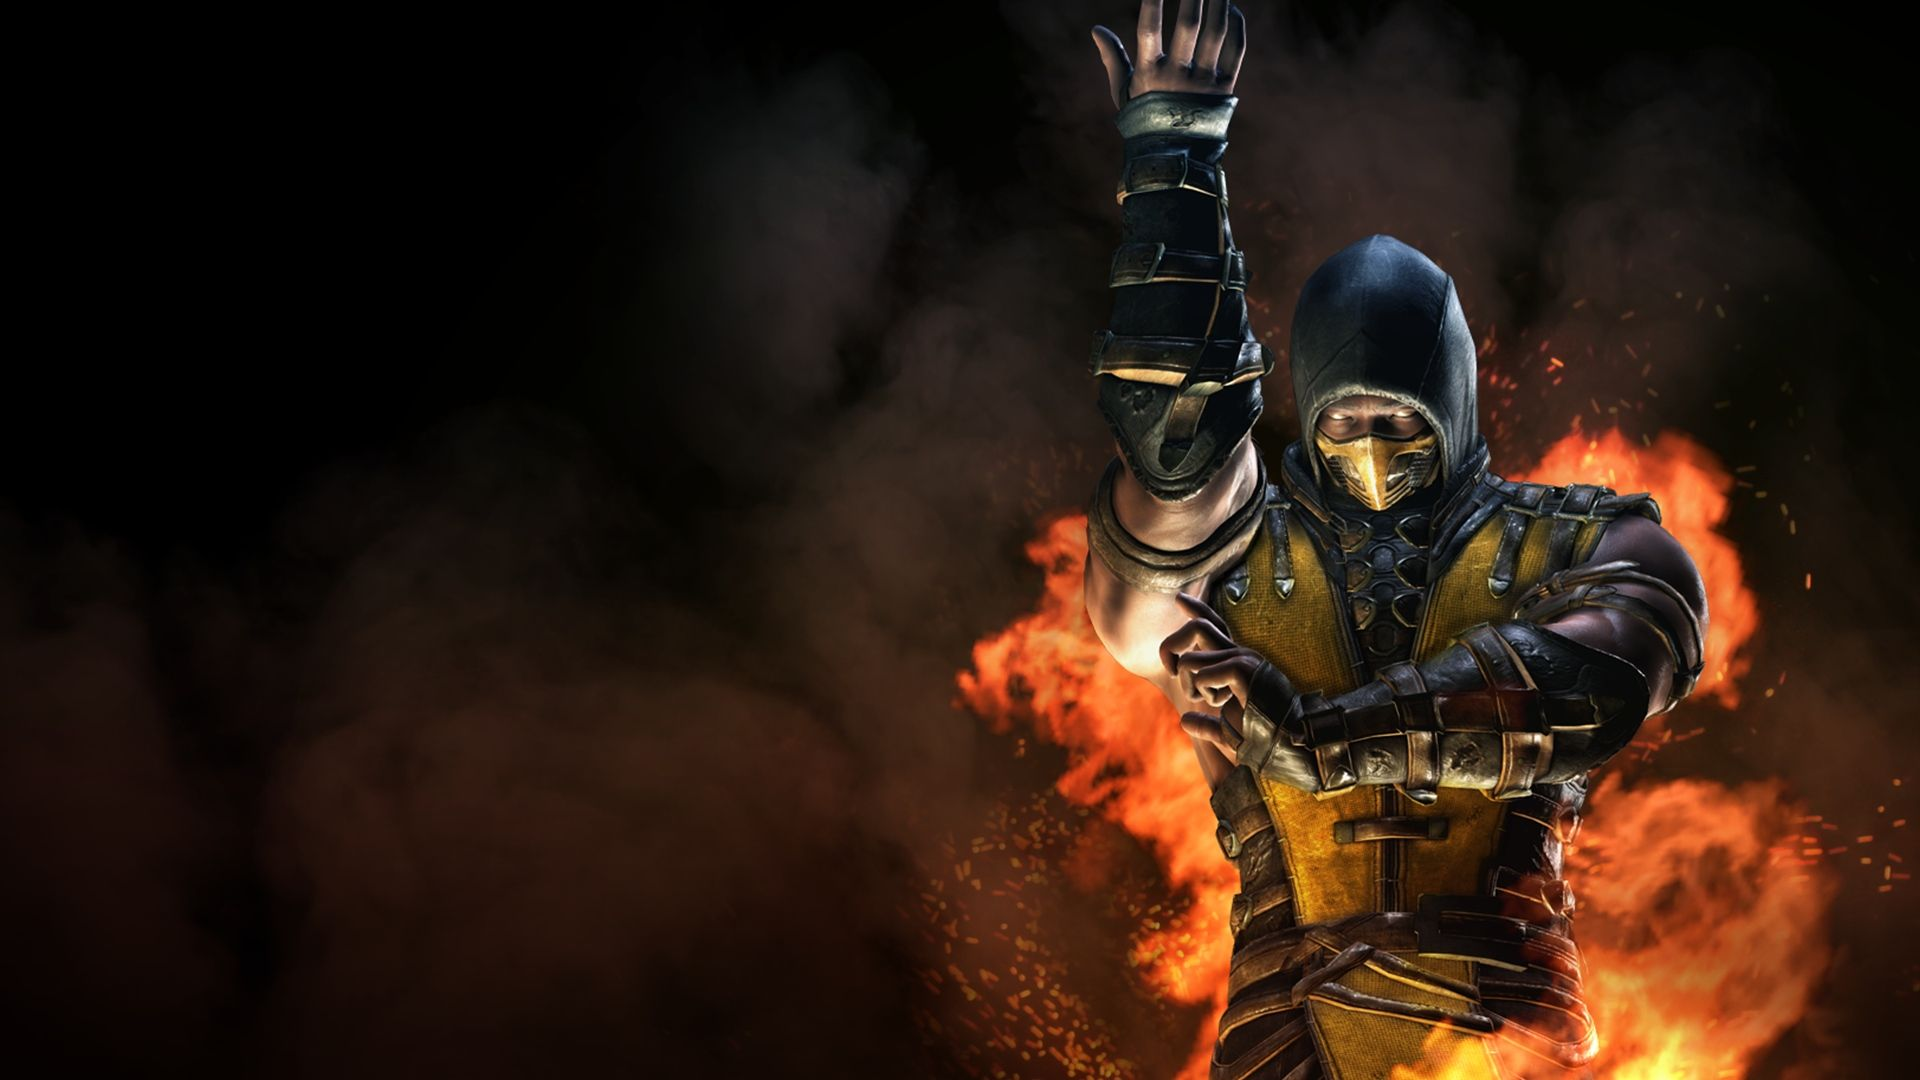 Mortal Kombat X Wallpaper Images Dje Mortal Kombat X Wallpapers Mortal Kombat X Scorpion Mortal Kombat